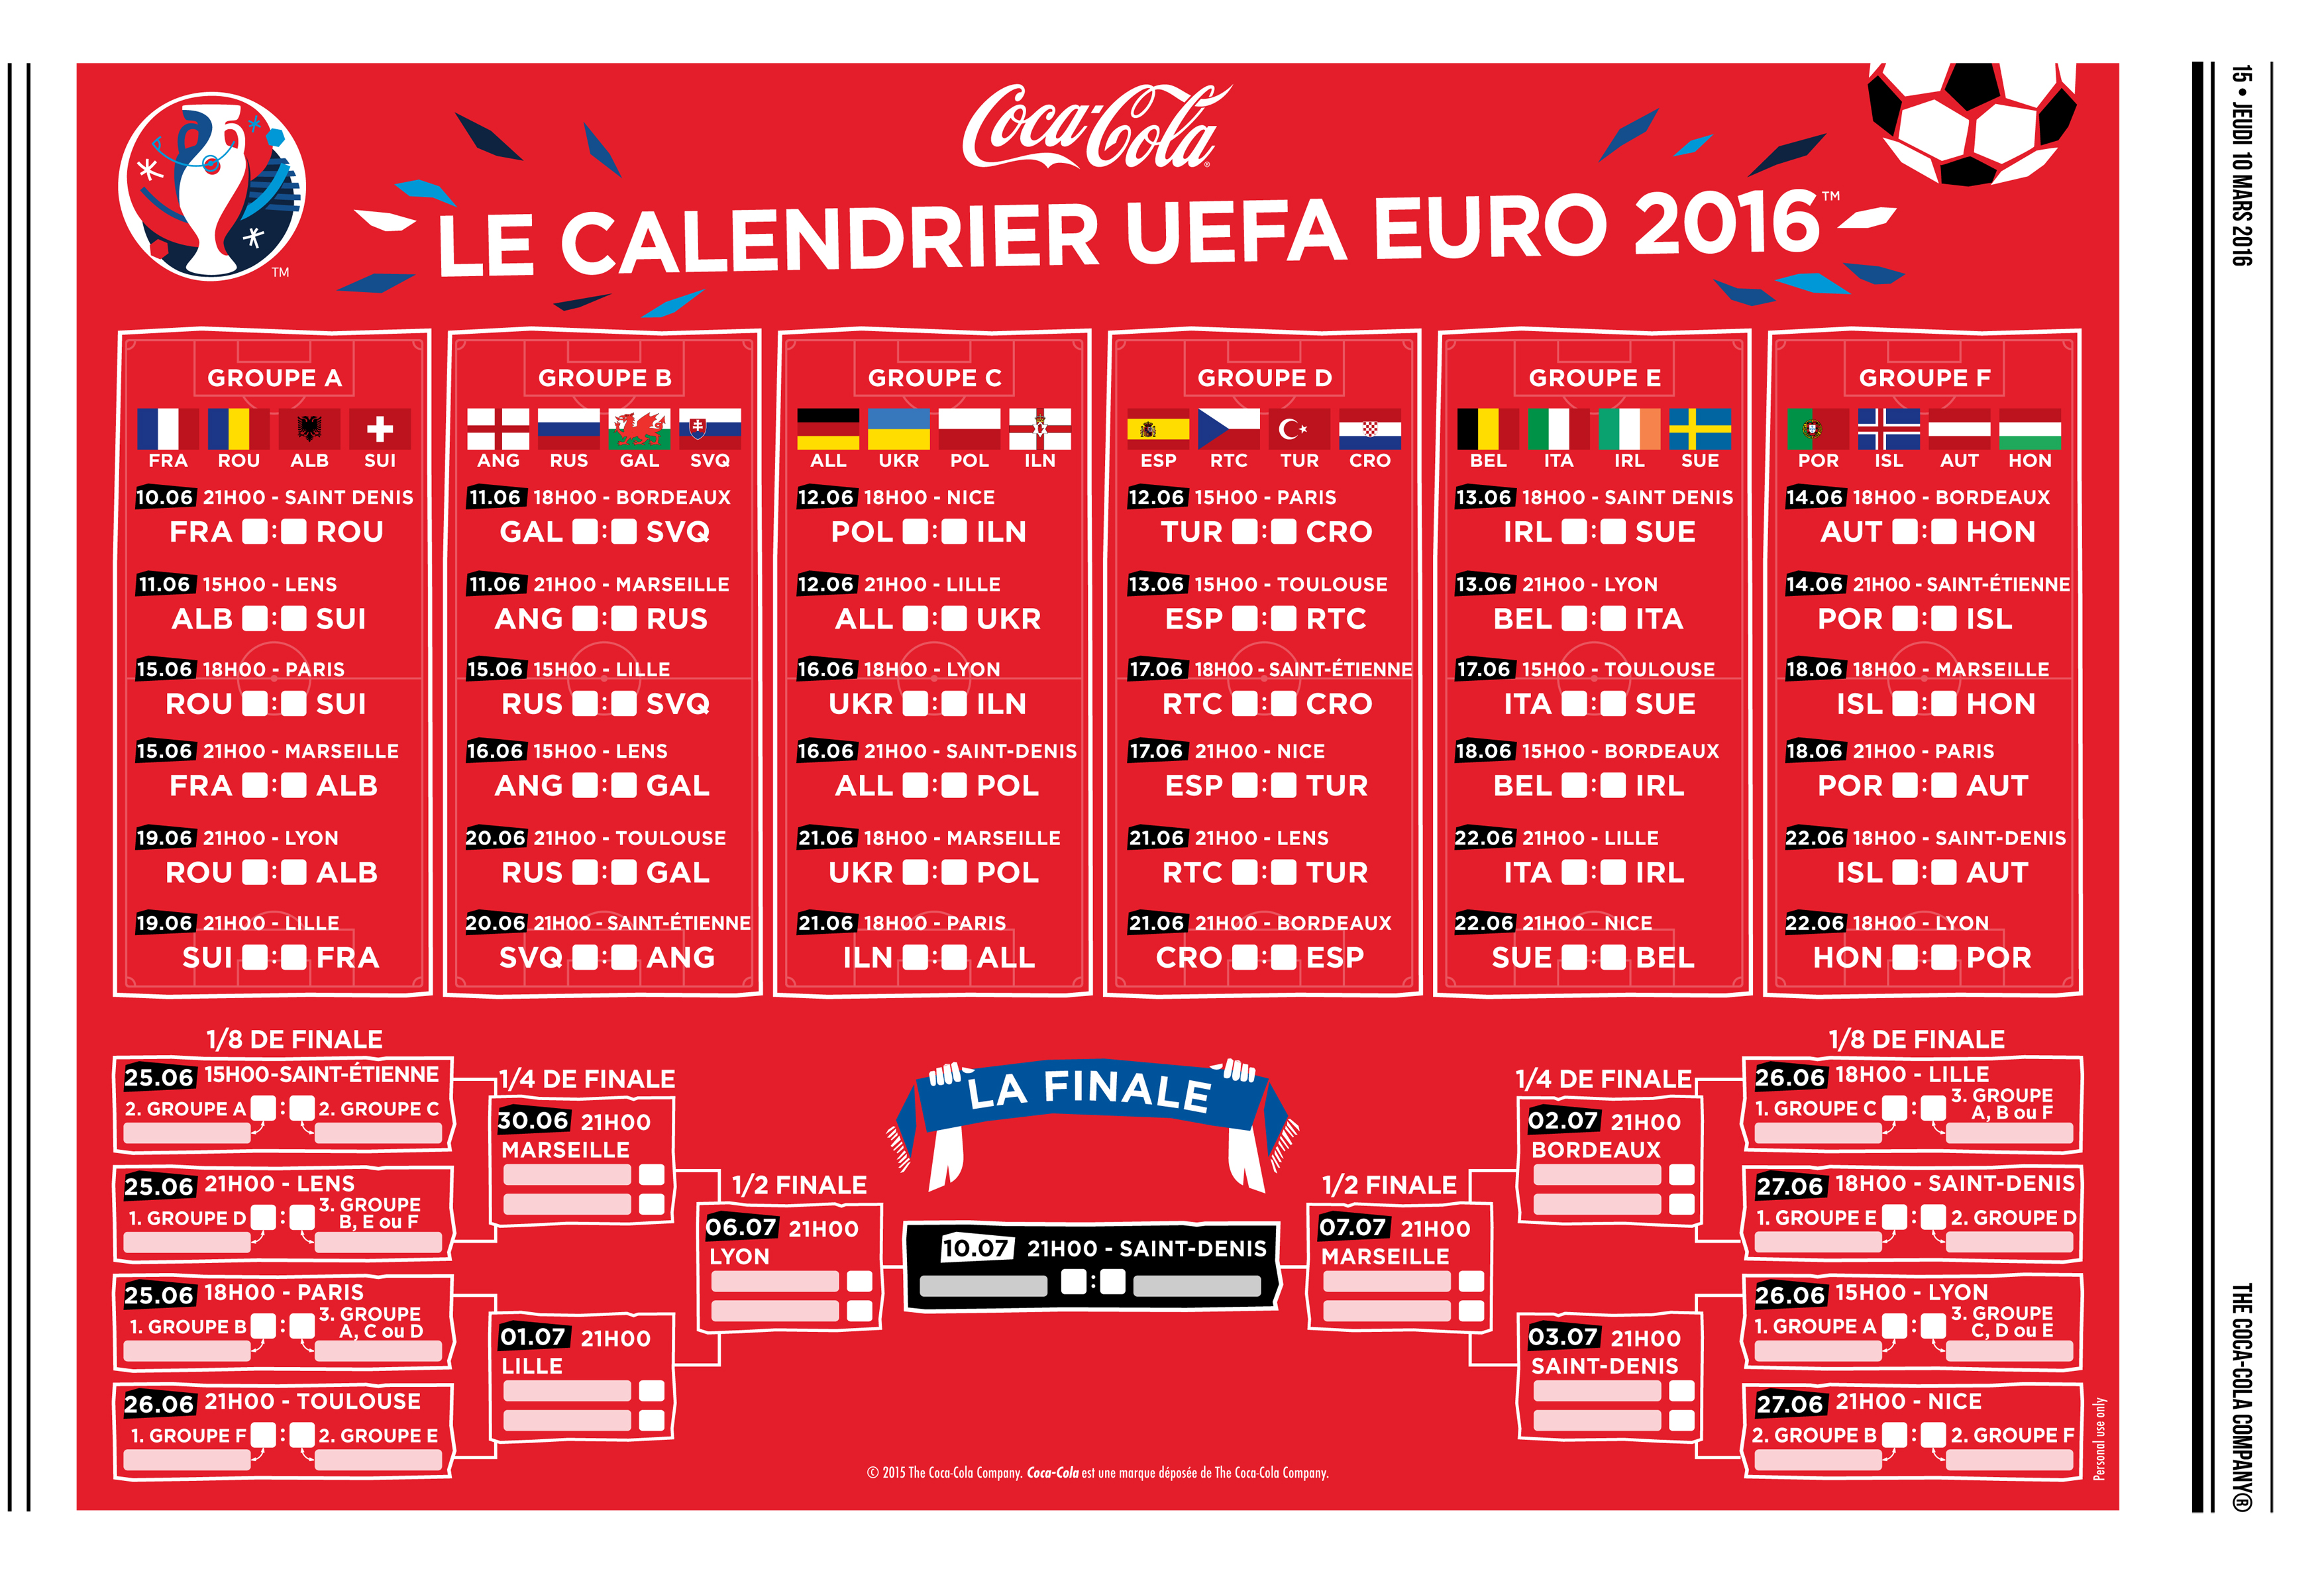 uefa euro 2016 comment coca cola va envahir le quotidien des fran ais dossier. Black Bedroom Furniture Sets. Home Design Ideas